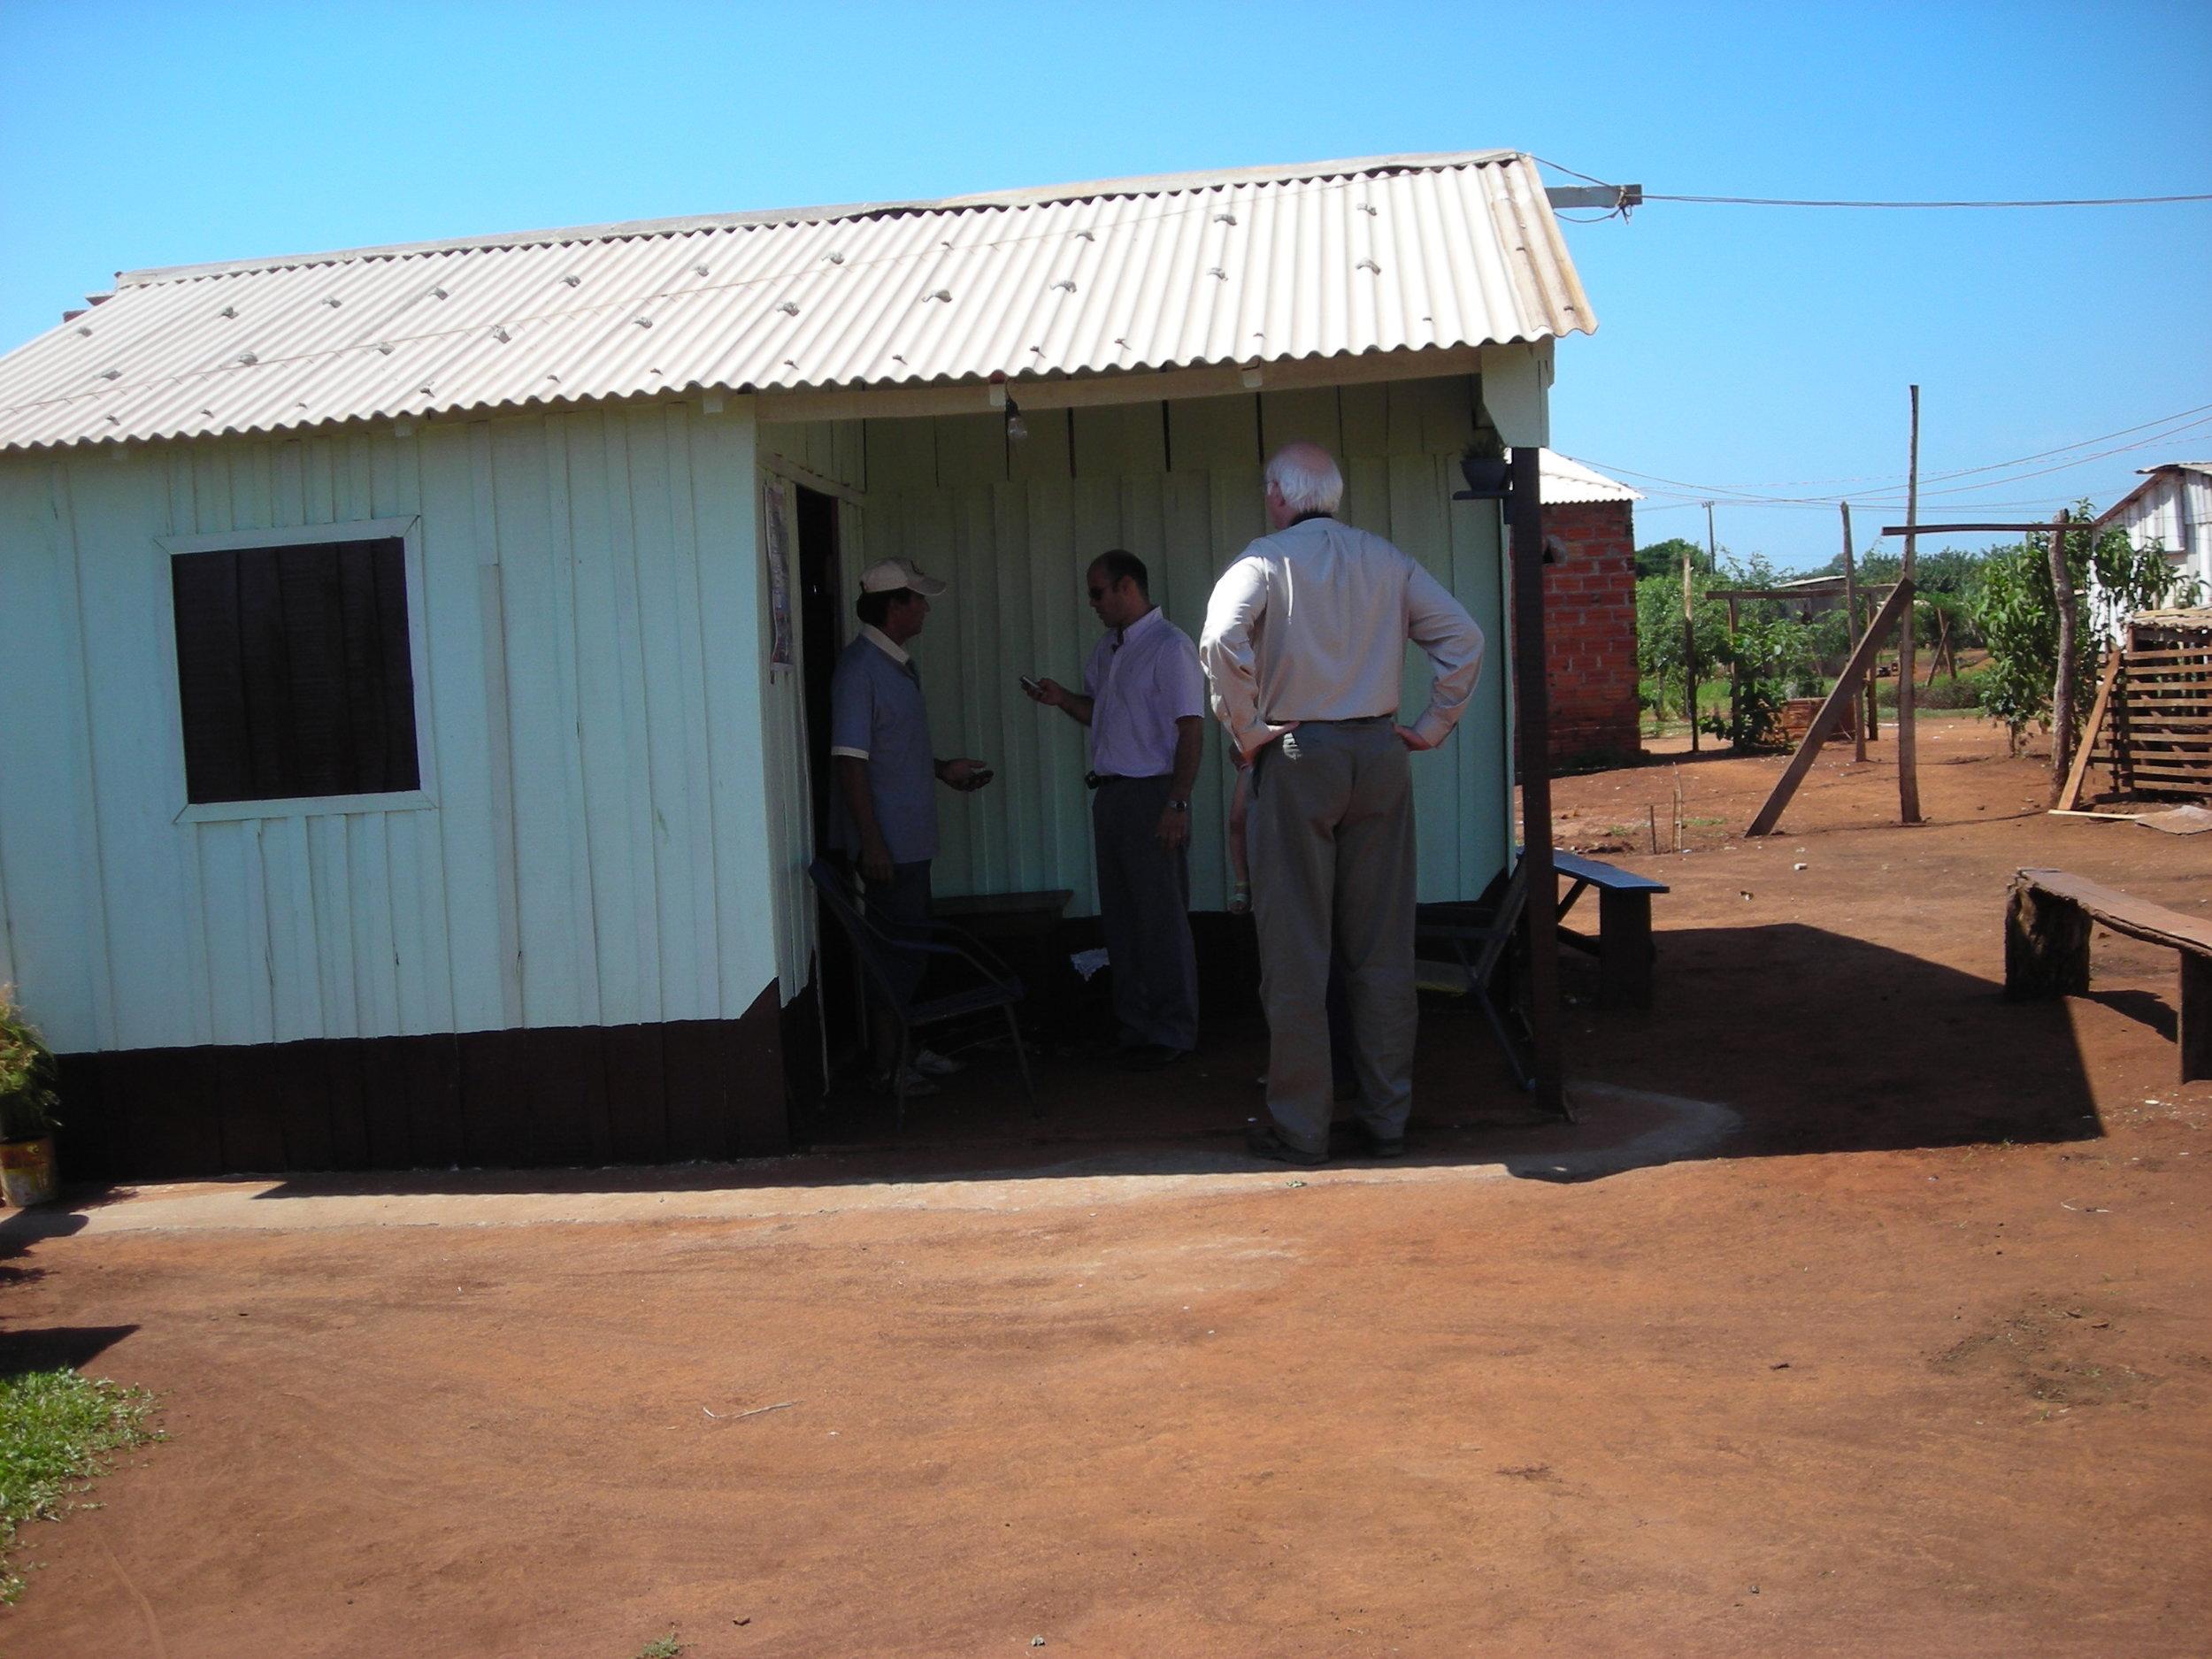 Dr. Ricardo Nizza's Campesino Clinic assessment site